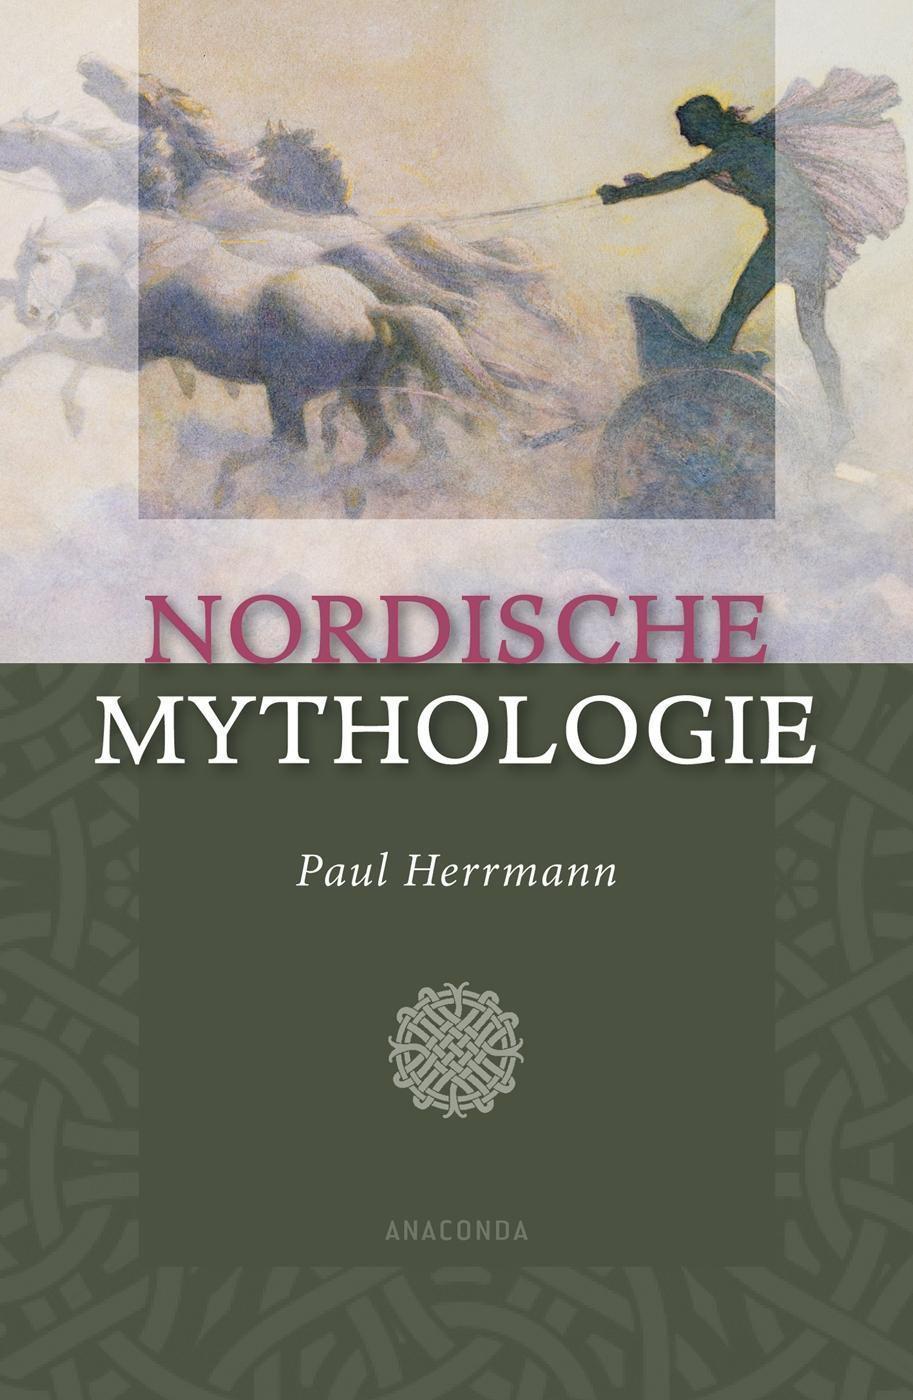 Nordische Mythologie 1